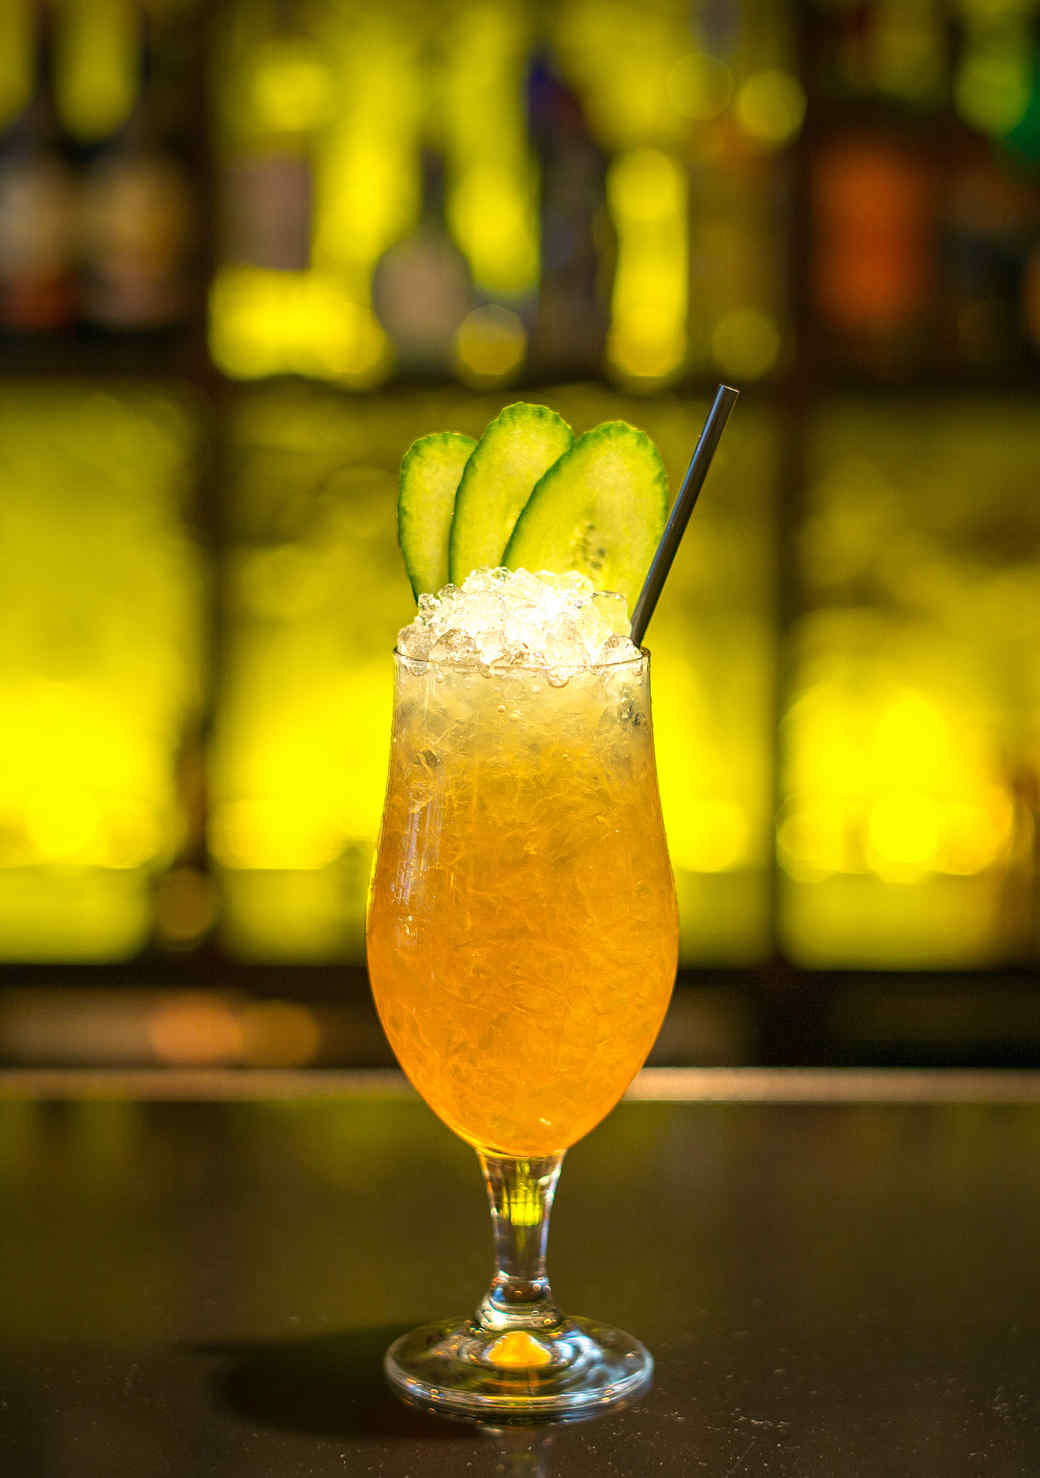 betony-amaro-kombucha-cocktail-0316.jpeg (skyword:244842)